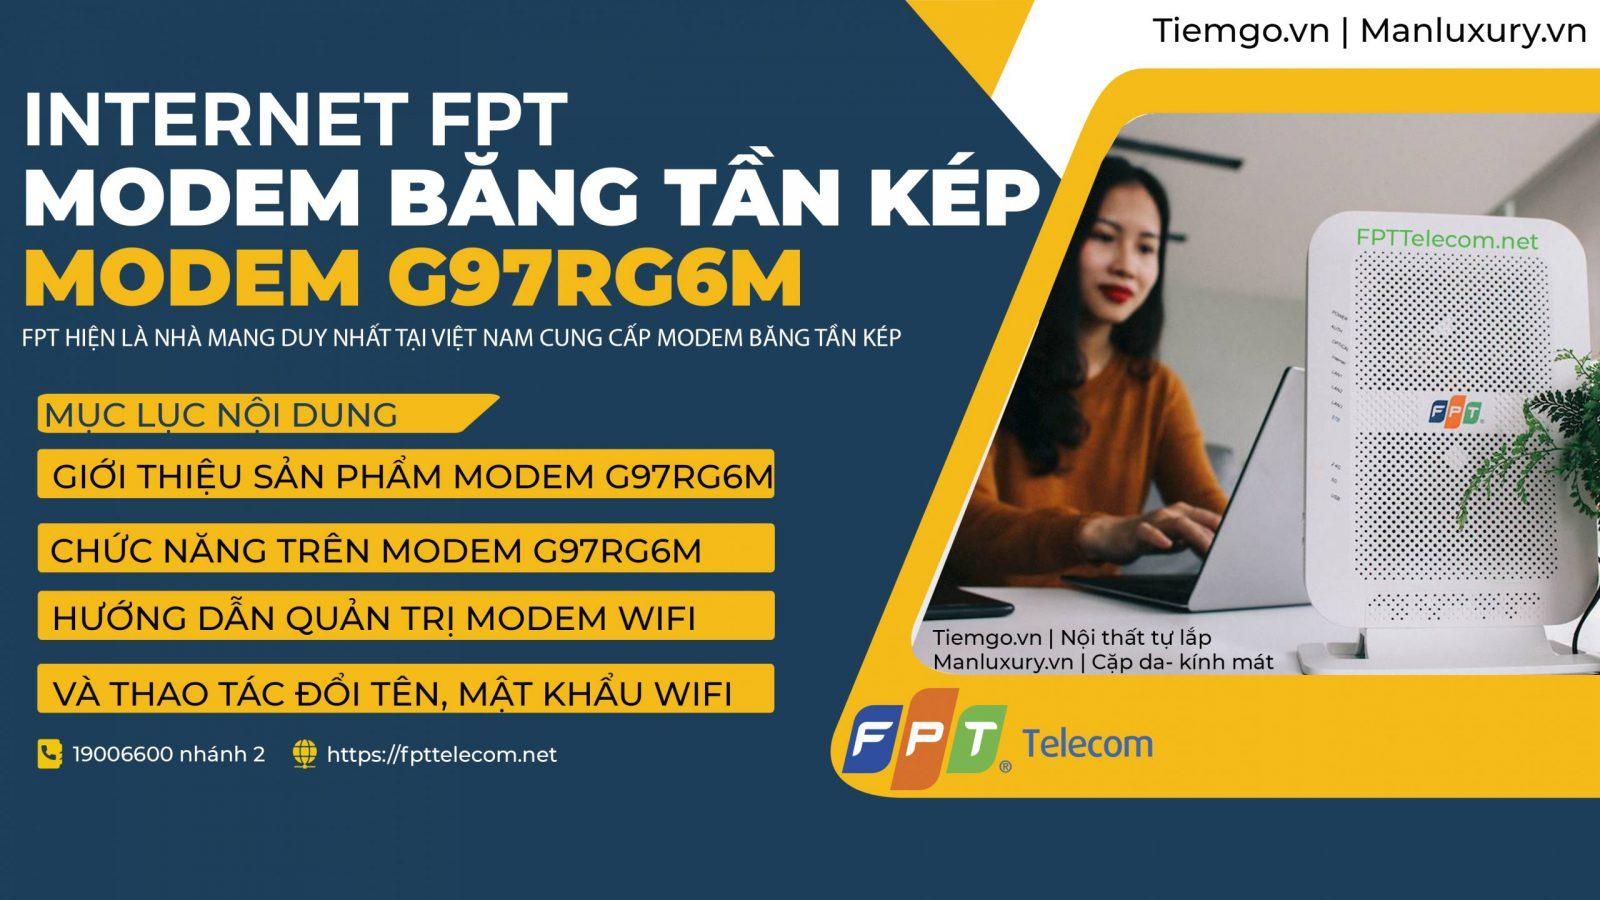 Modem wifi băng tần kép FPT